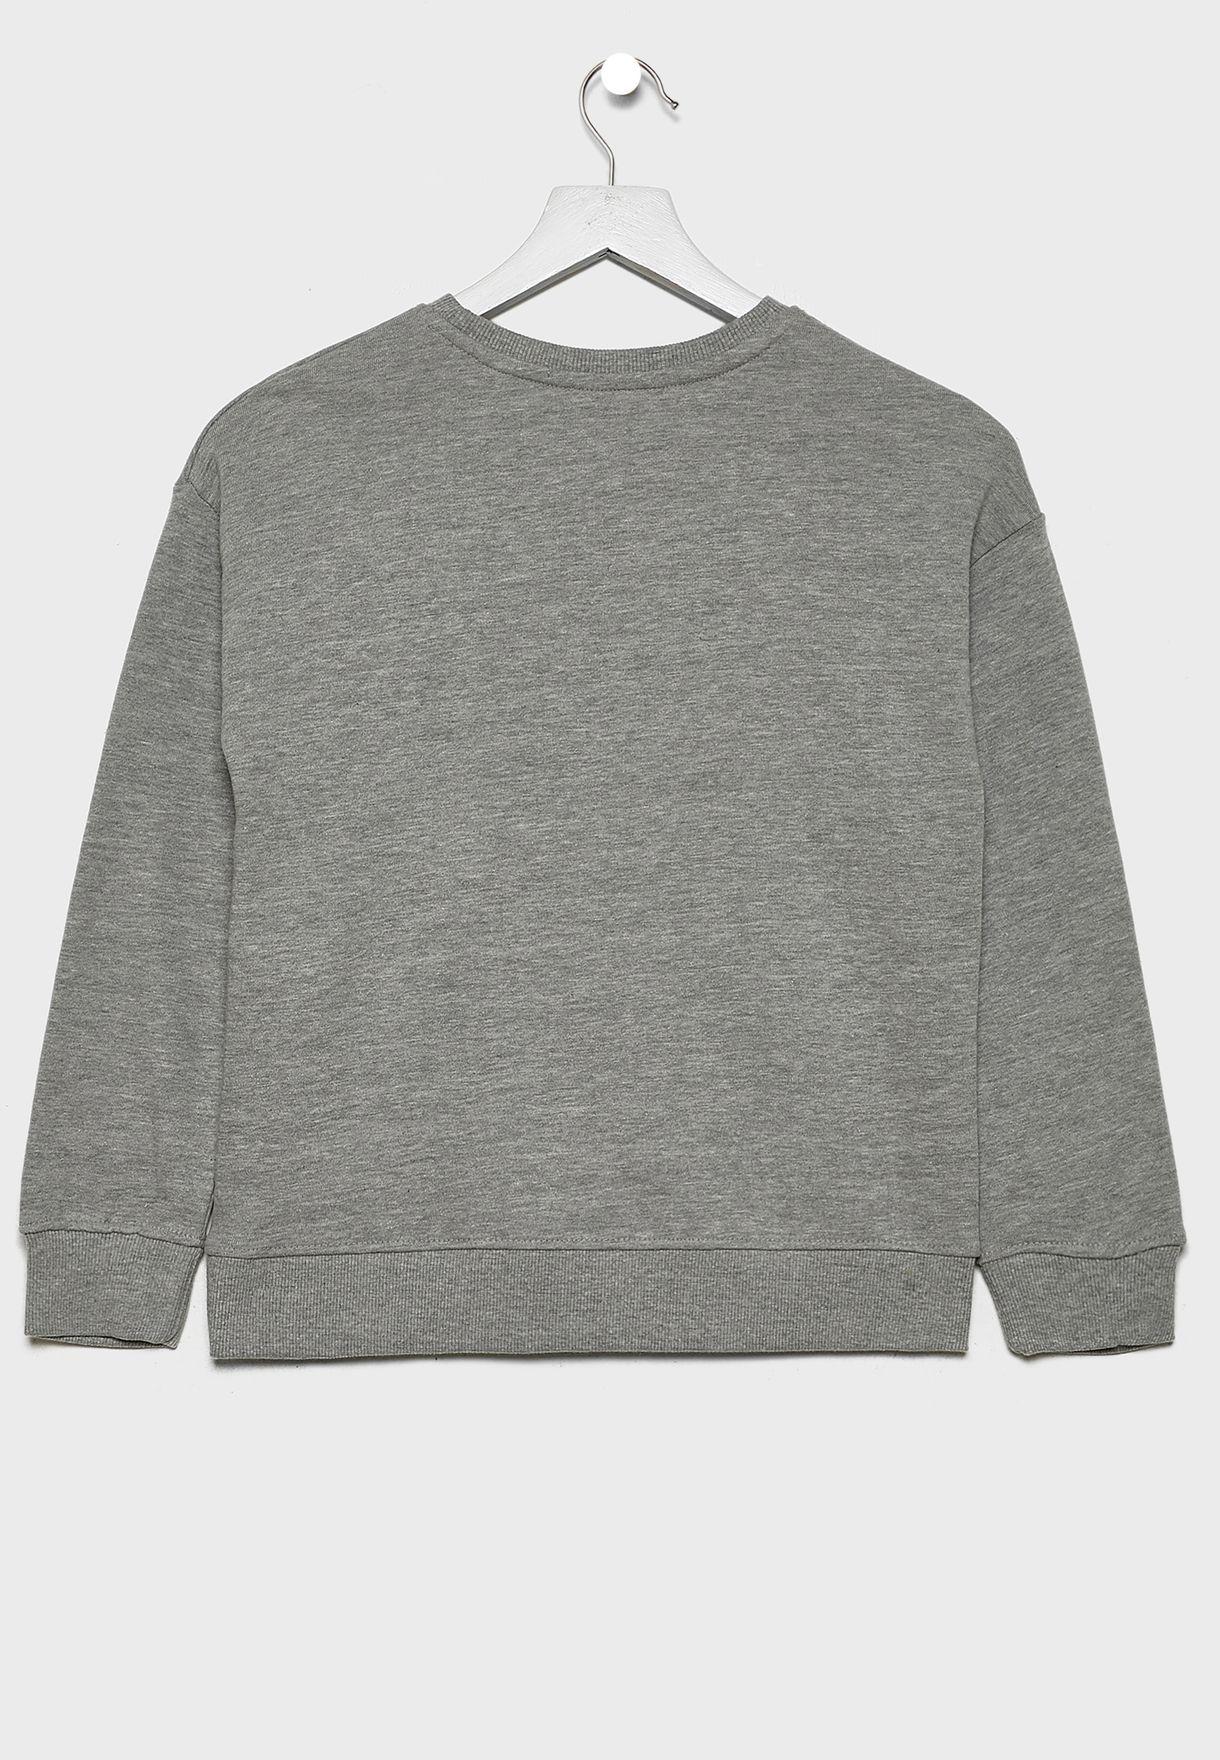 Kids Graphic Sweatshirt